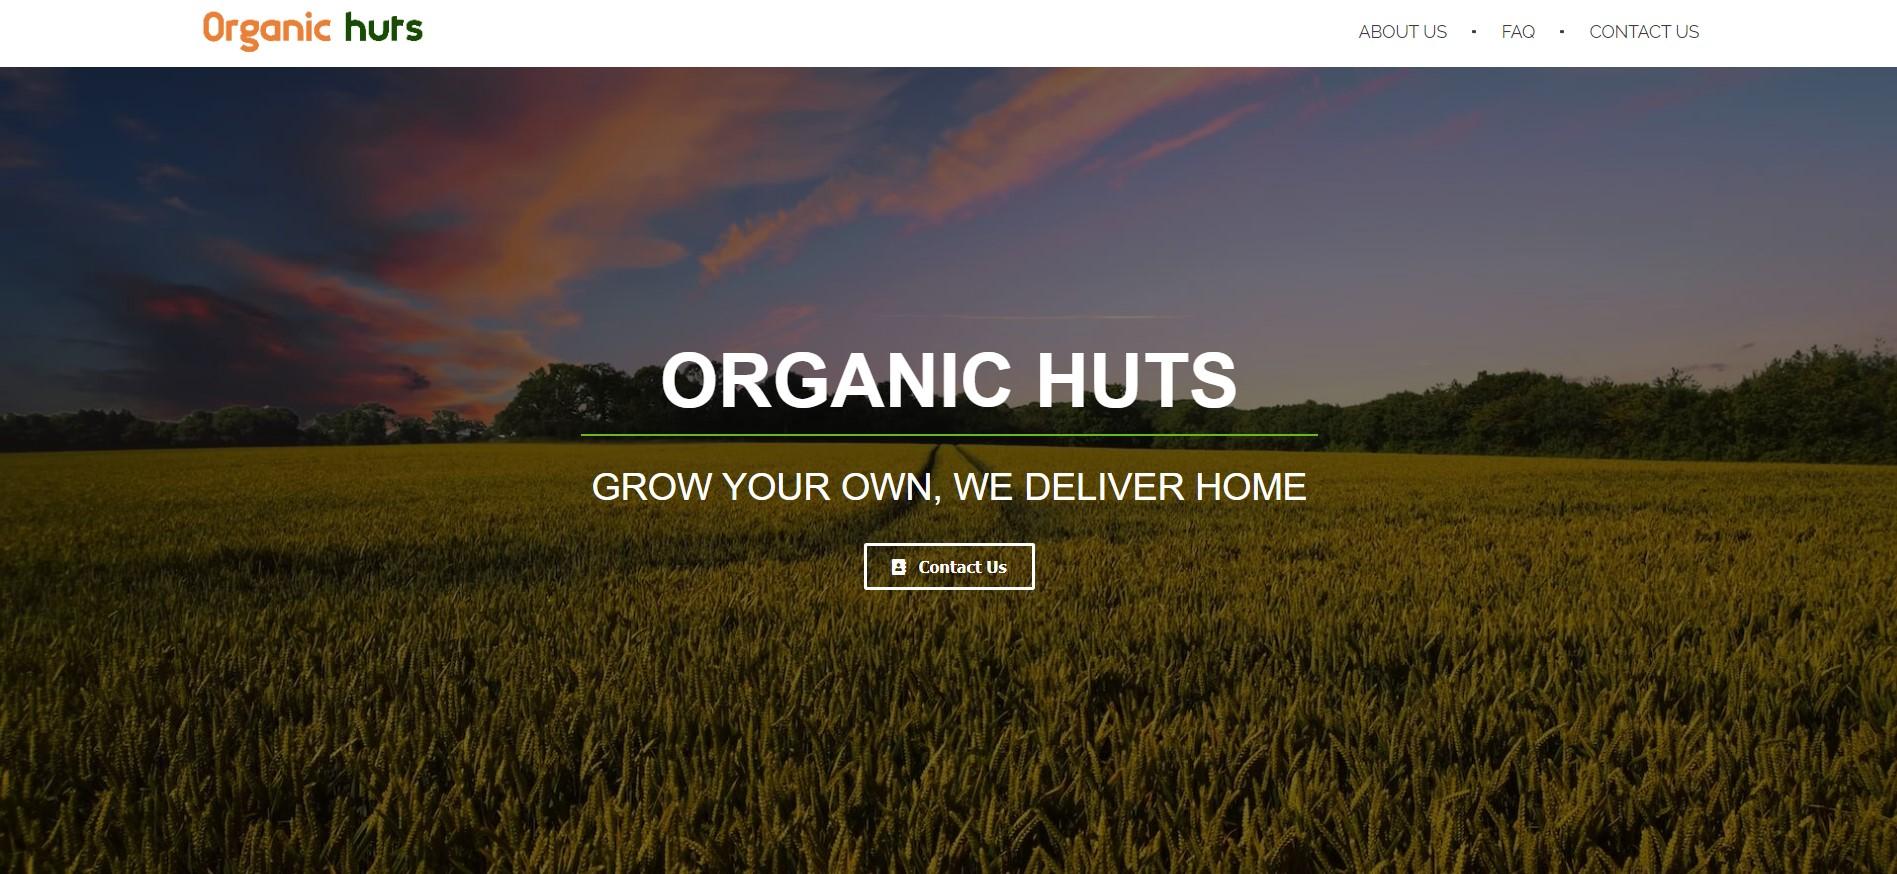 organichuts.com